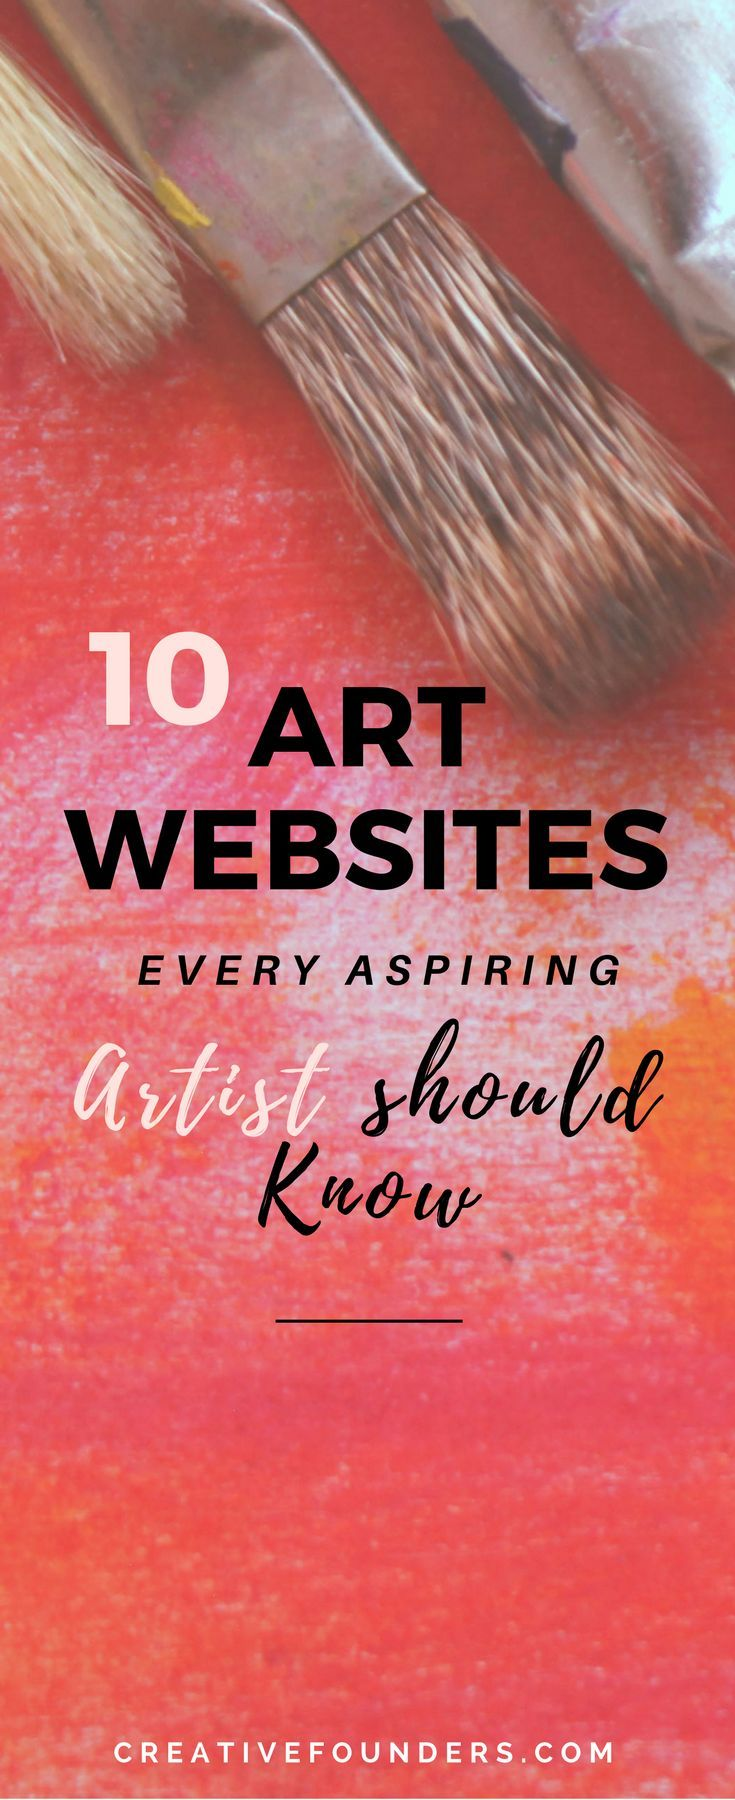 Artist Marketing Resource // ArtMaze Mag // Carve Out Time for Art // The Jealous Curator // The Artist Market Co. // Creative Boom // Maria Brophy // The Art Biz Blog // Artsy Shark // The Abundant Artist // Creative Founders // Creativefounders.com #art #artbiz #sellartonline #artwebsites #sellart